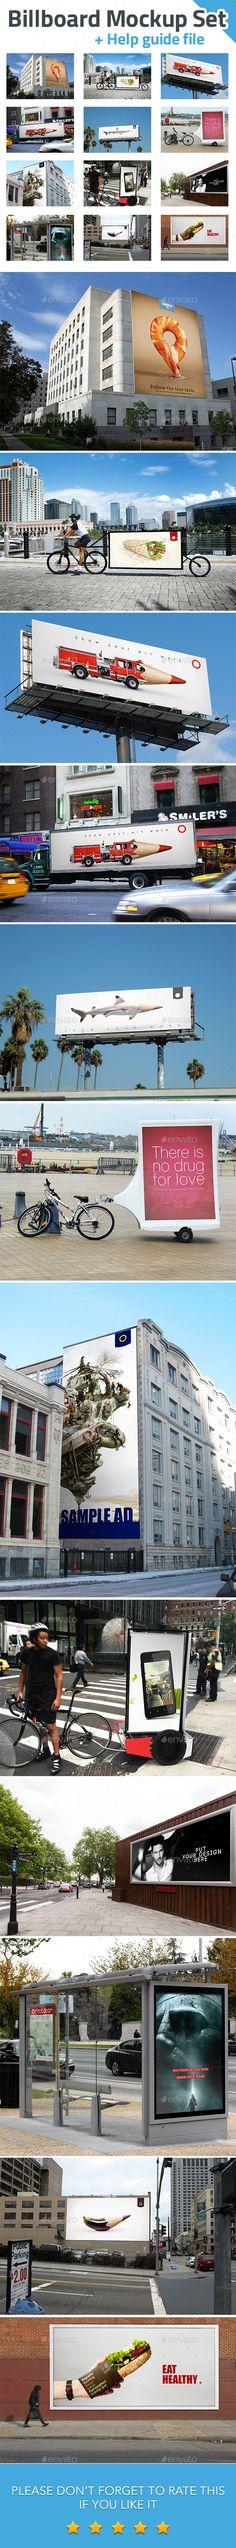 Billboard Mockup Set | #billboardmockup | Download: http://graphicriver.net/item/billboard-mockup-set/9323620?ref=ksioks